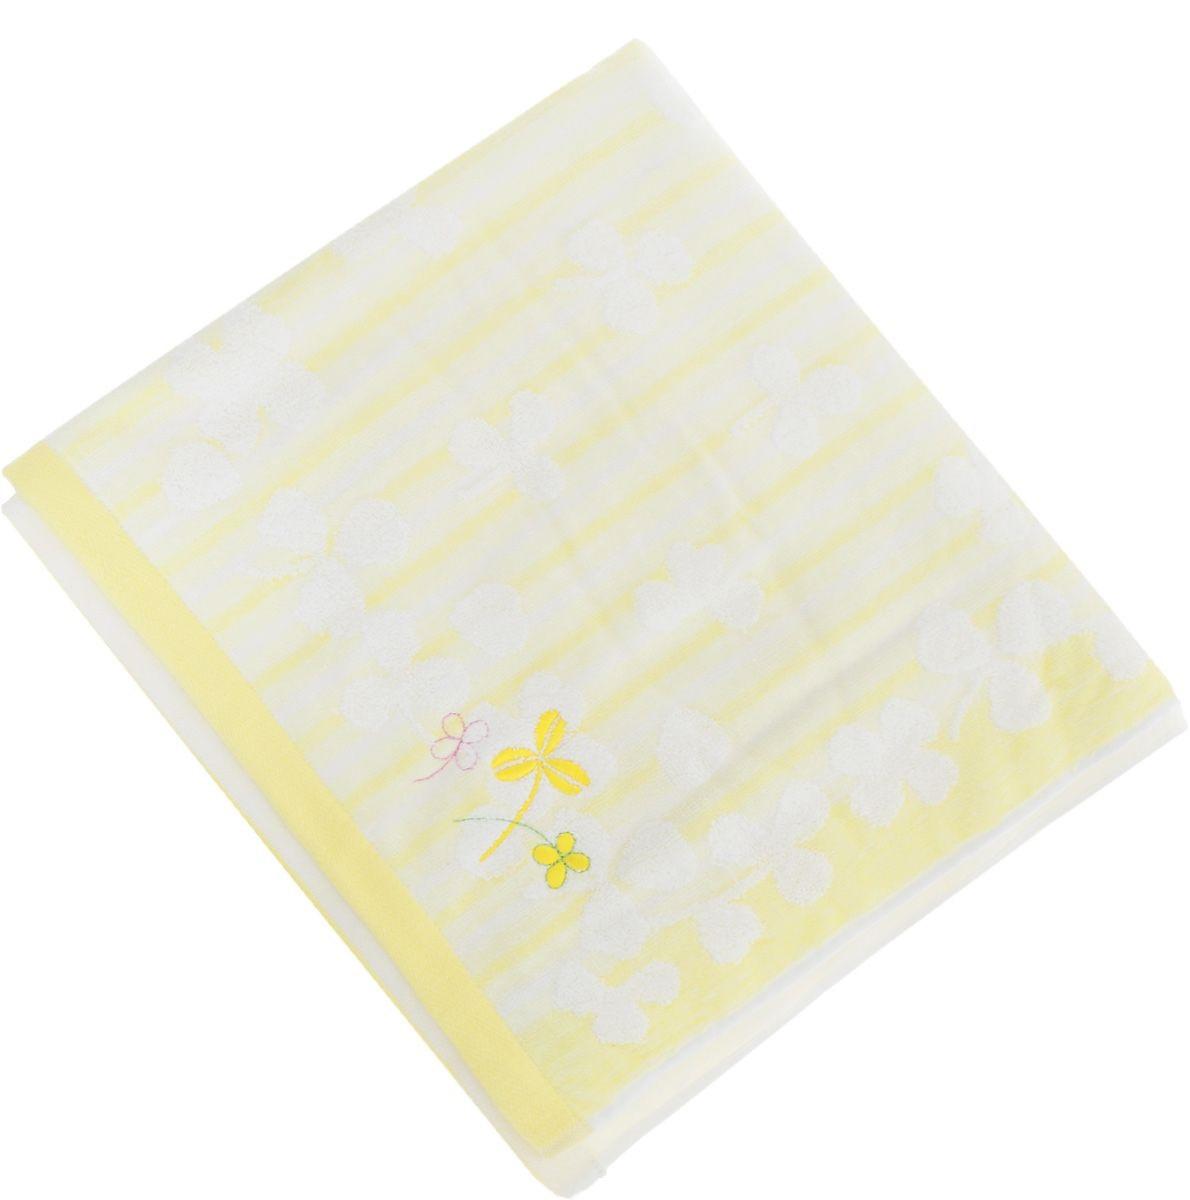 Полотенца Soavita Полотенце Desy Цвет: Желтый (48х90 см) soavita soavita полотенце andrea цвет желтый 70х120 см